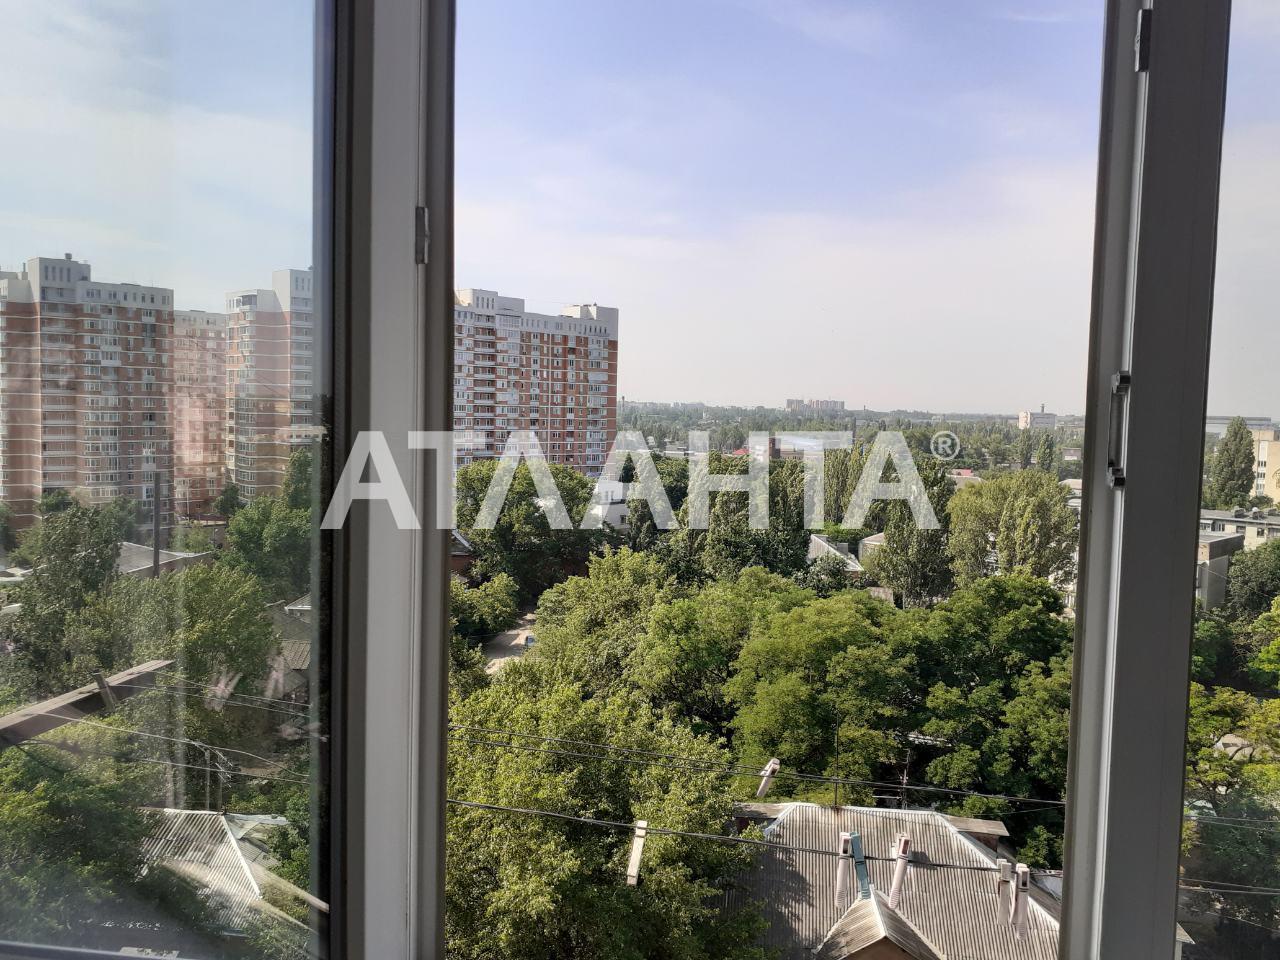 Продается 1-комнатная Квартира на ул. Ядова Сергея (Юбилейная) — 35 000 у.е. (фото №10)